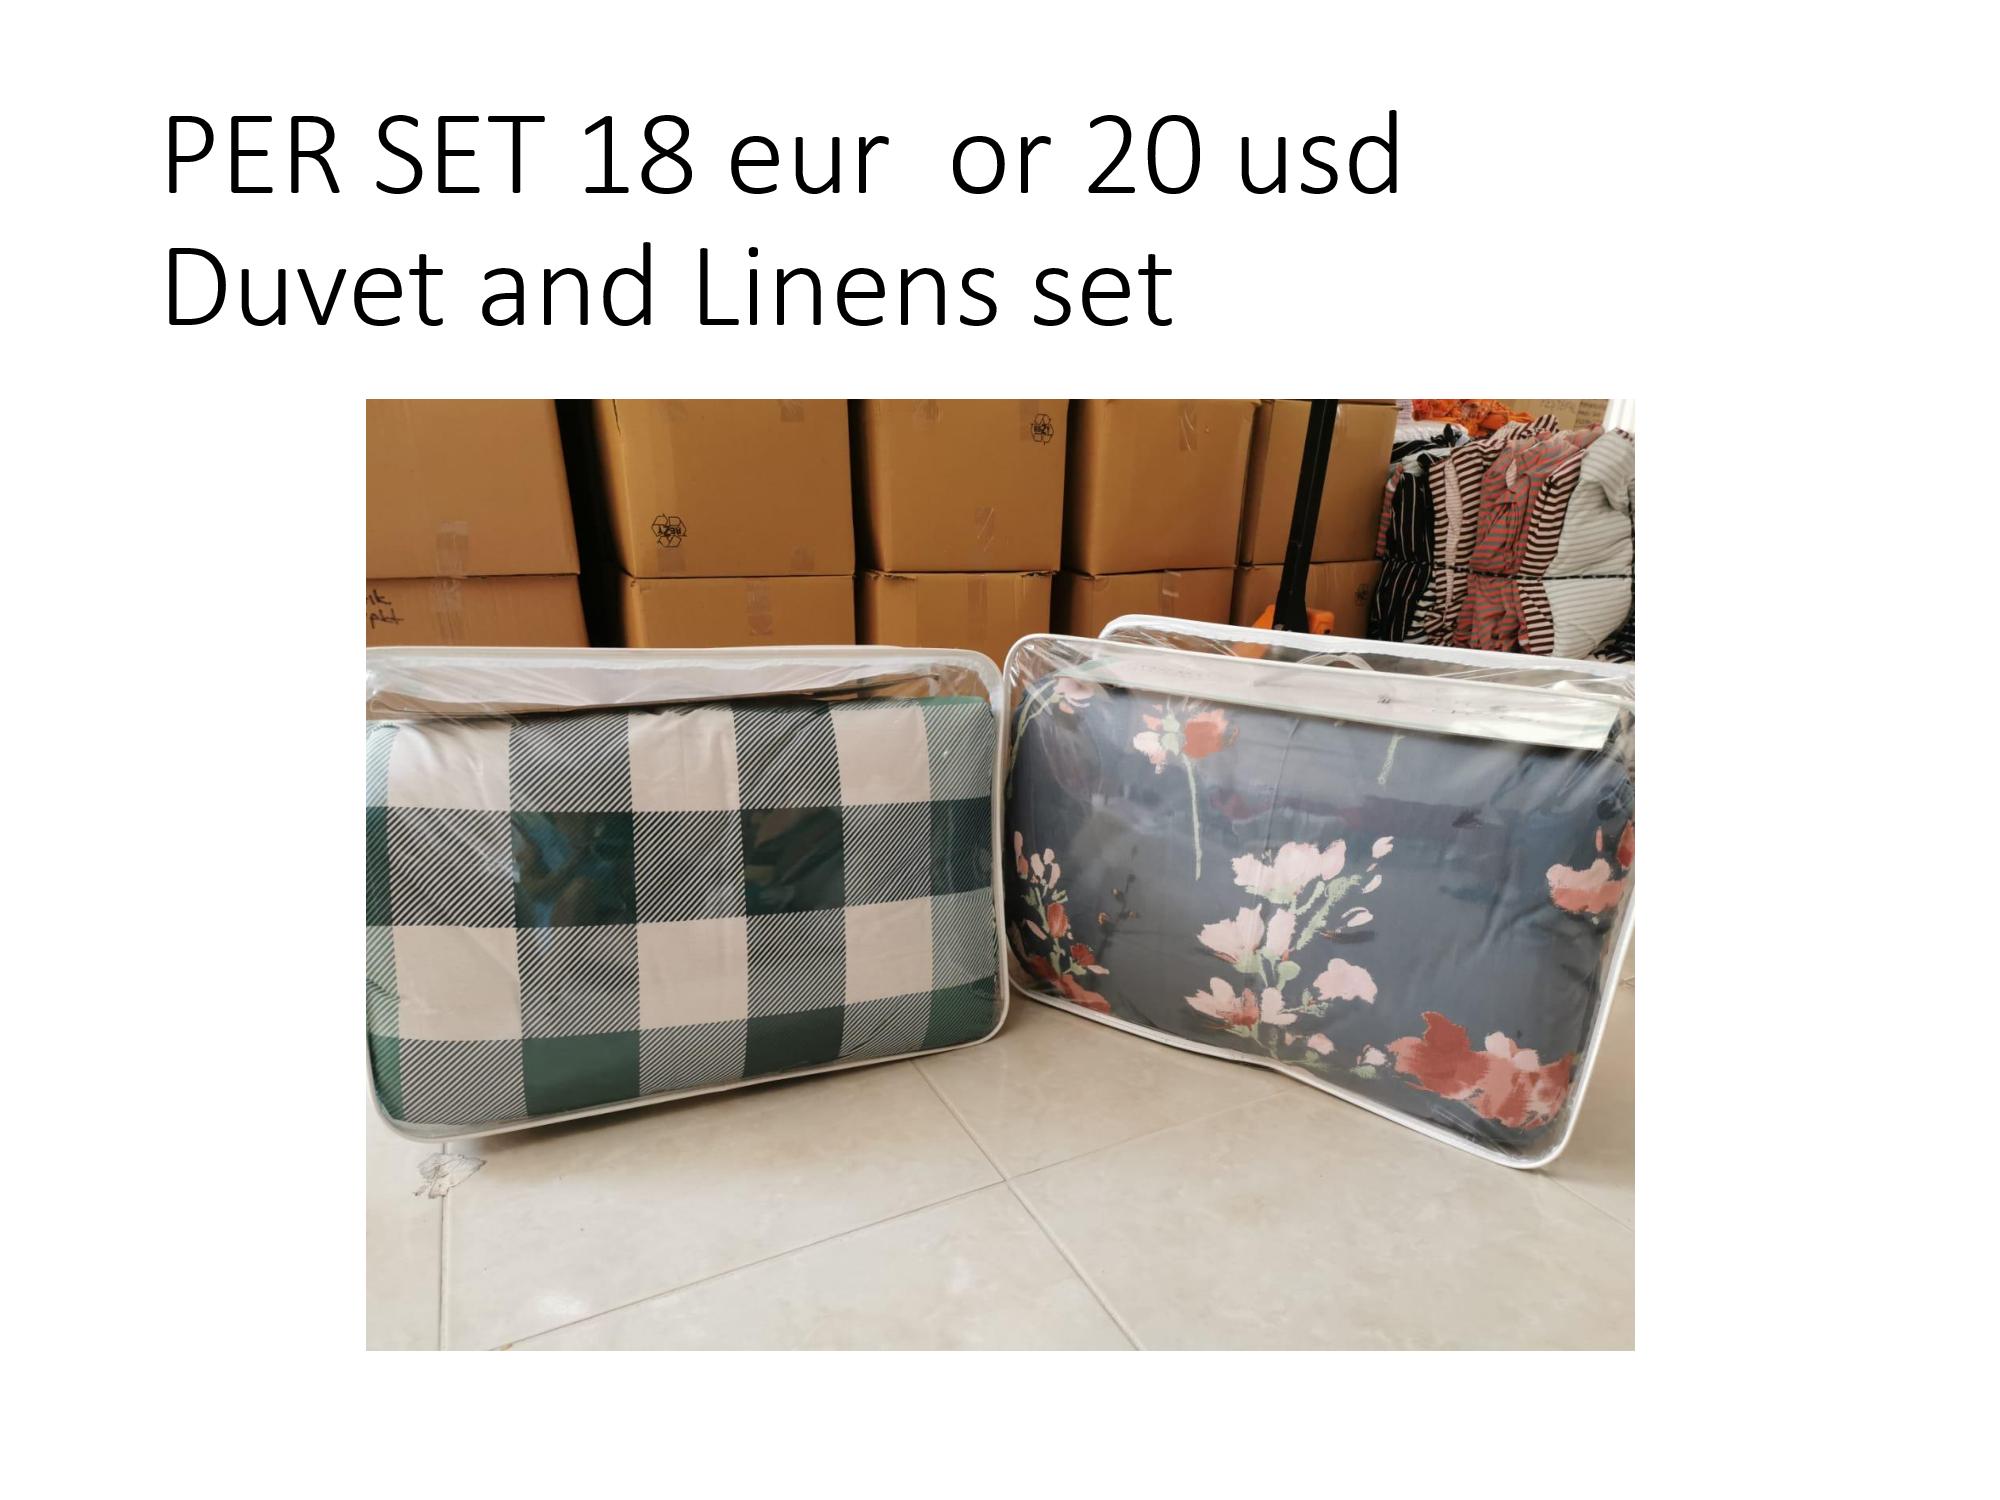 Duvet and Linen Sets